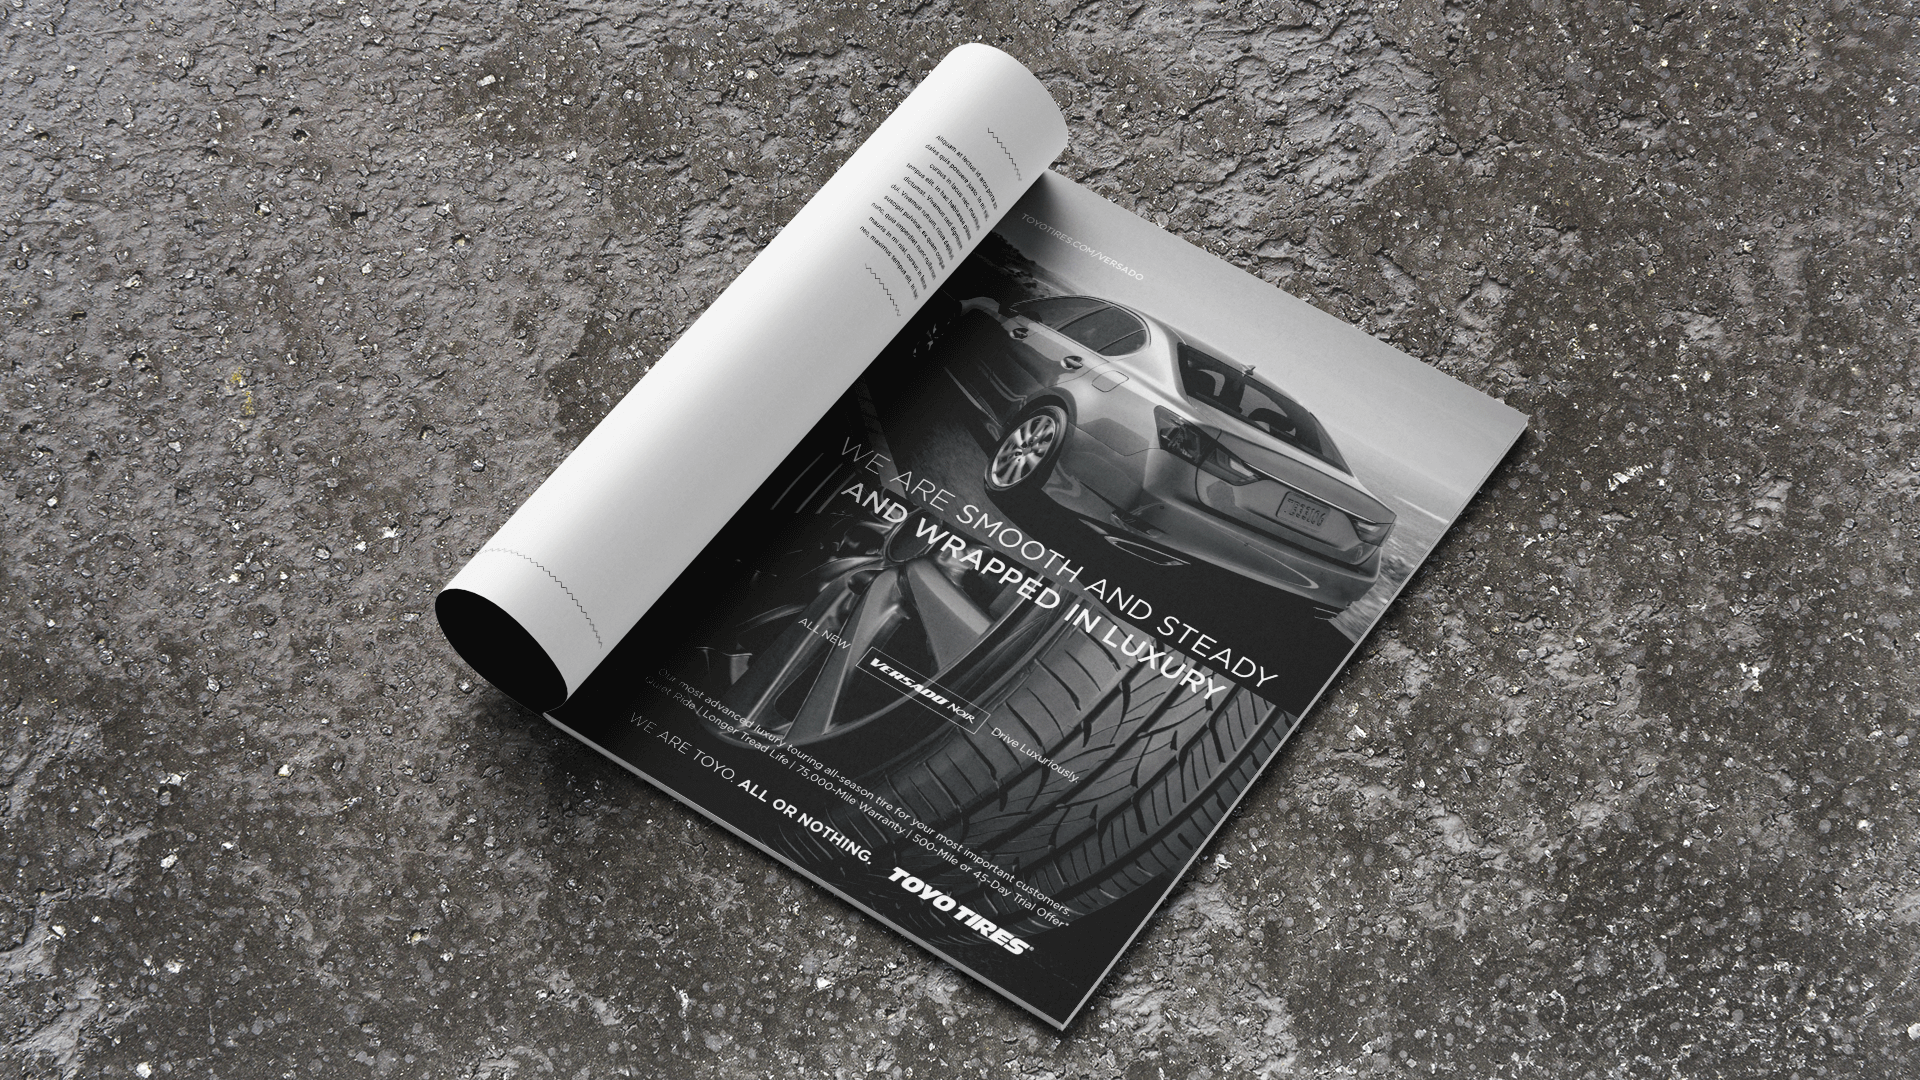 Toyo Tires rock print ad